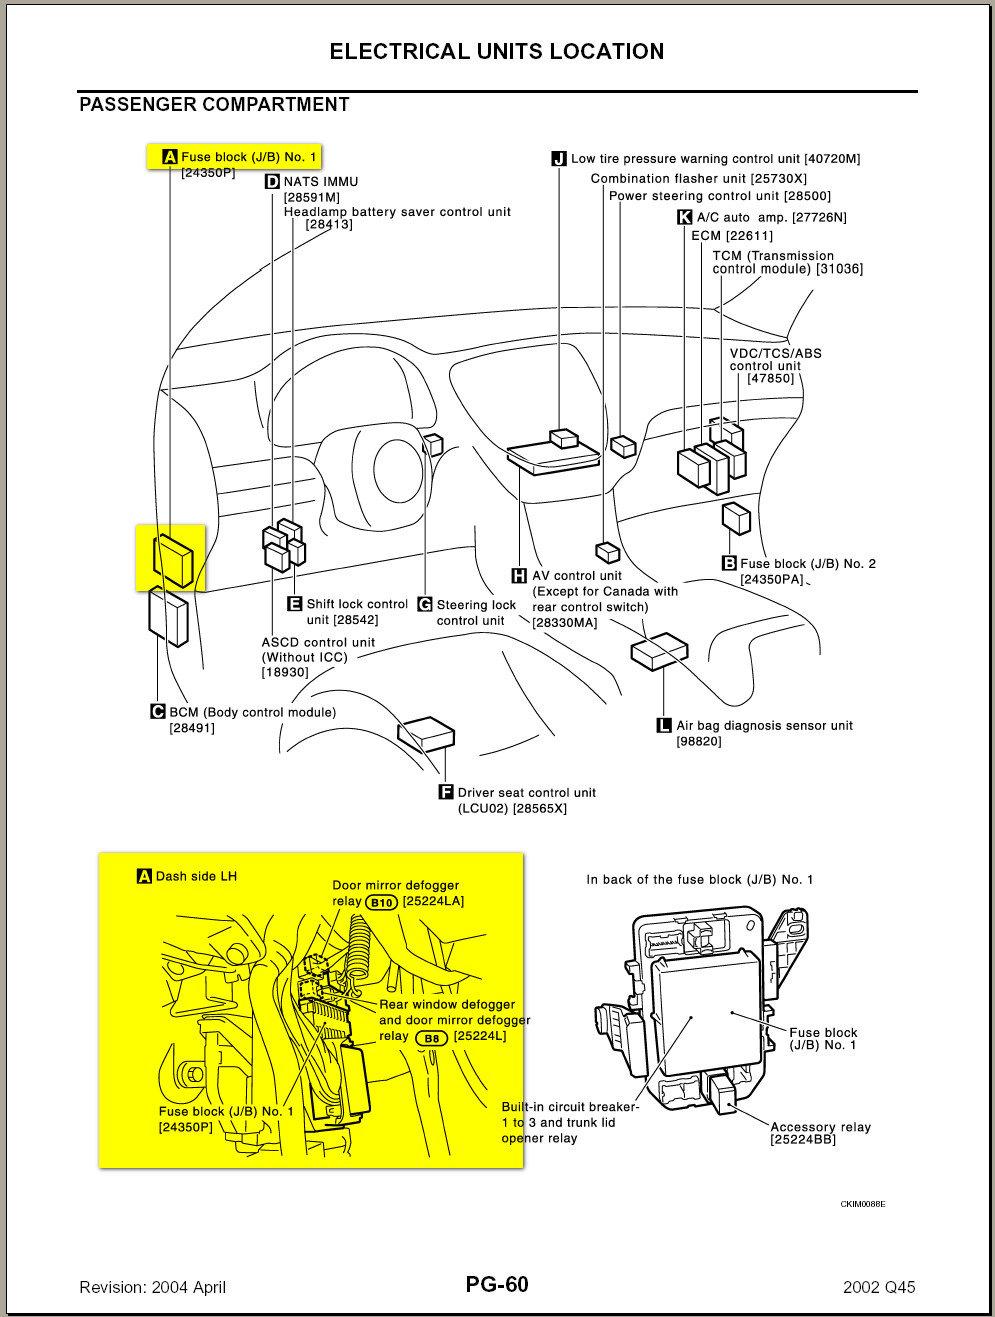 infiniti q45 fuse box diagram wiring diagrams 2002 Q45 Fuse Box Diagram infiniti q45 fuse box location wiring